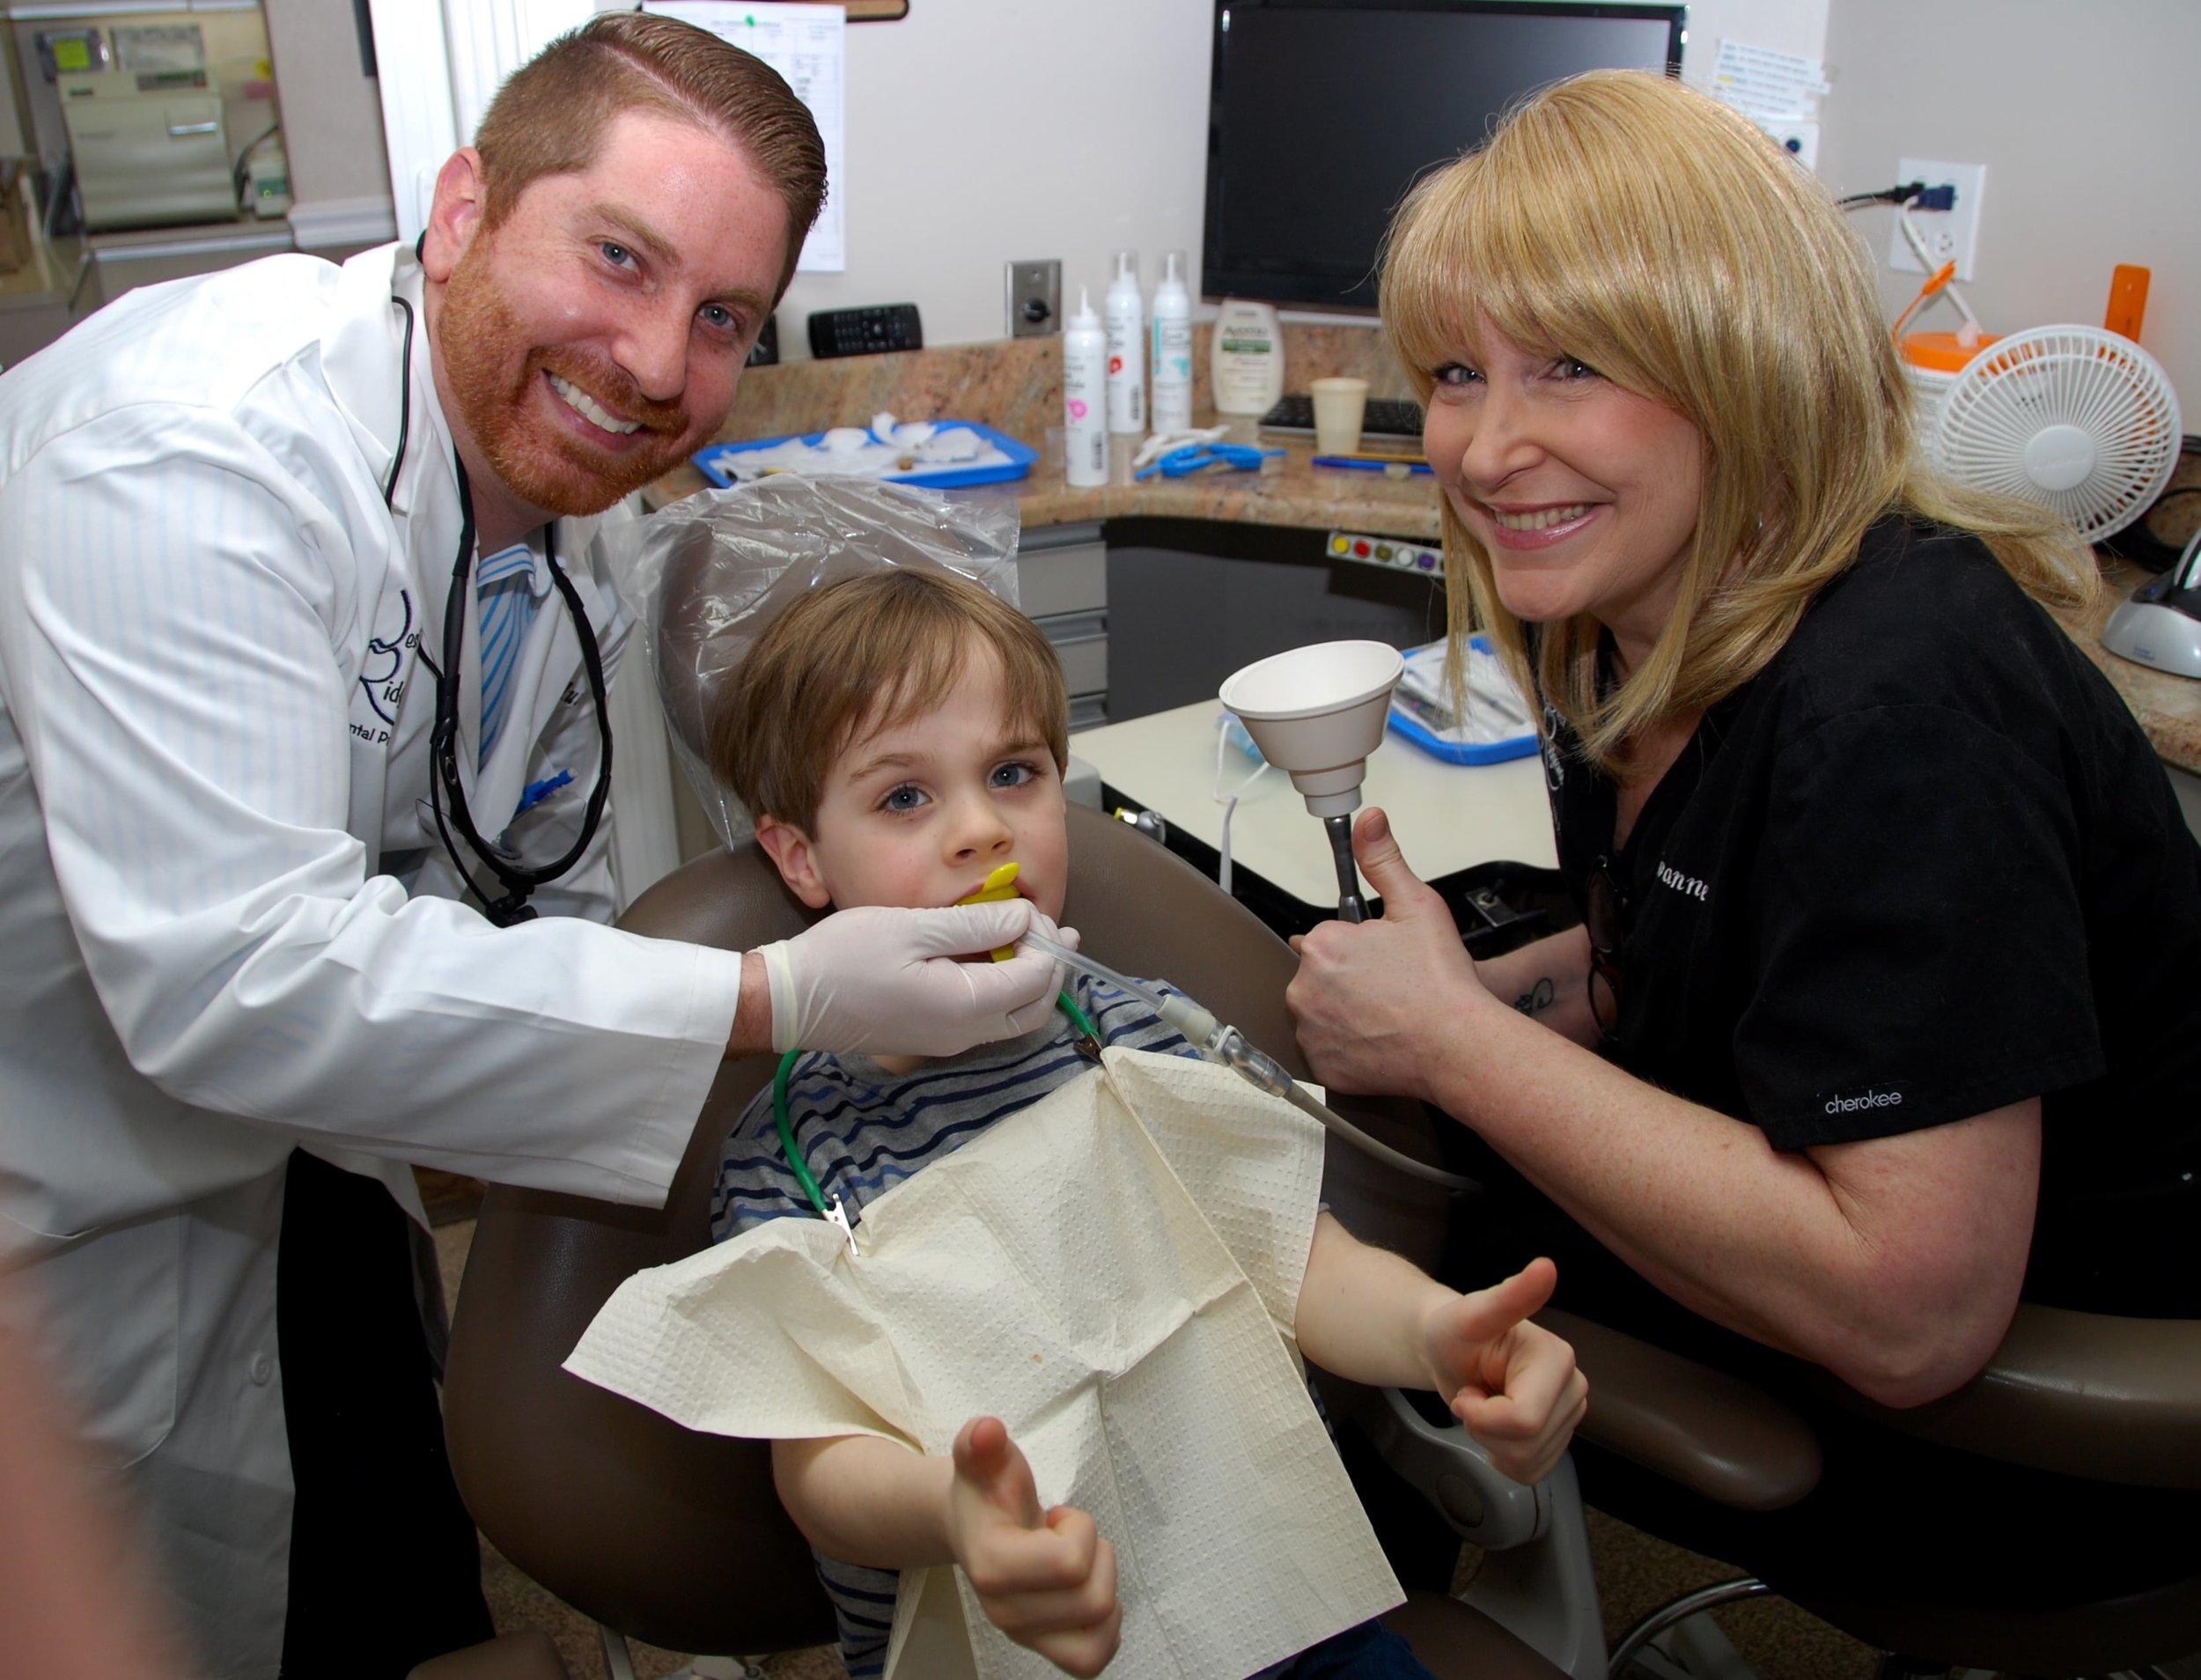 West Ridgewood Dental Professionals - Top Bergen County Dentist